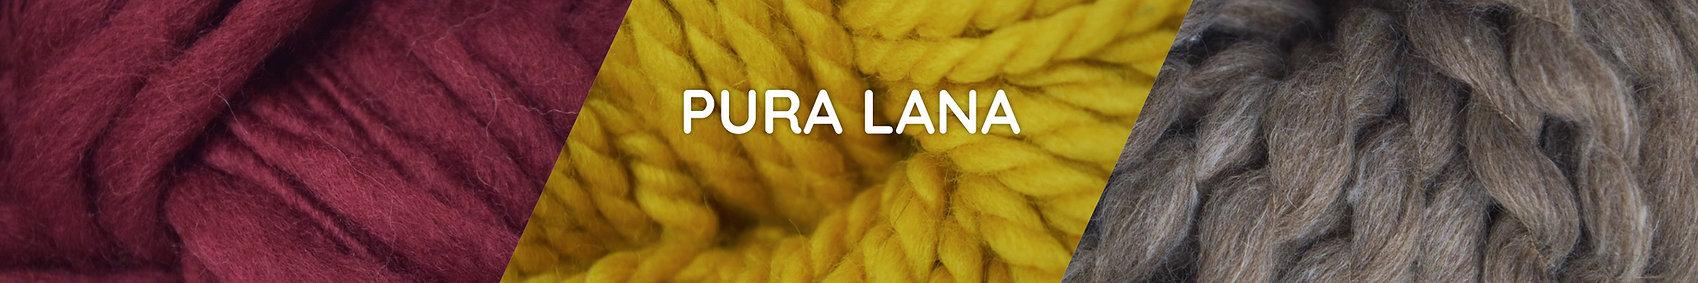 PORTADA PURA LANA 500px.jpg